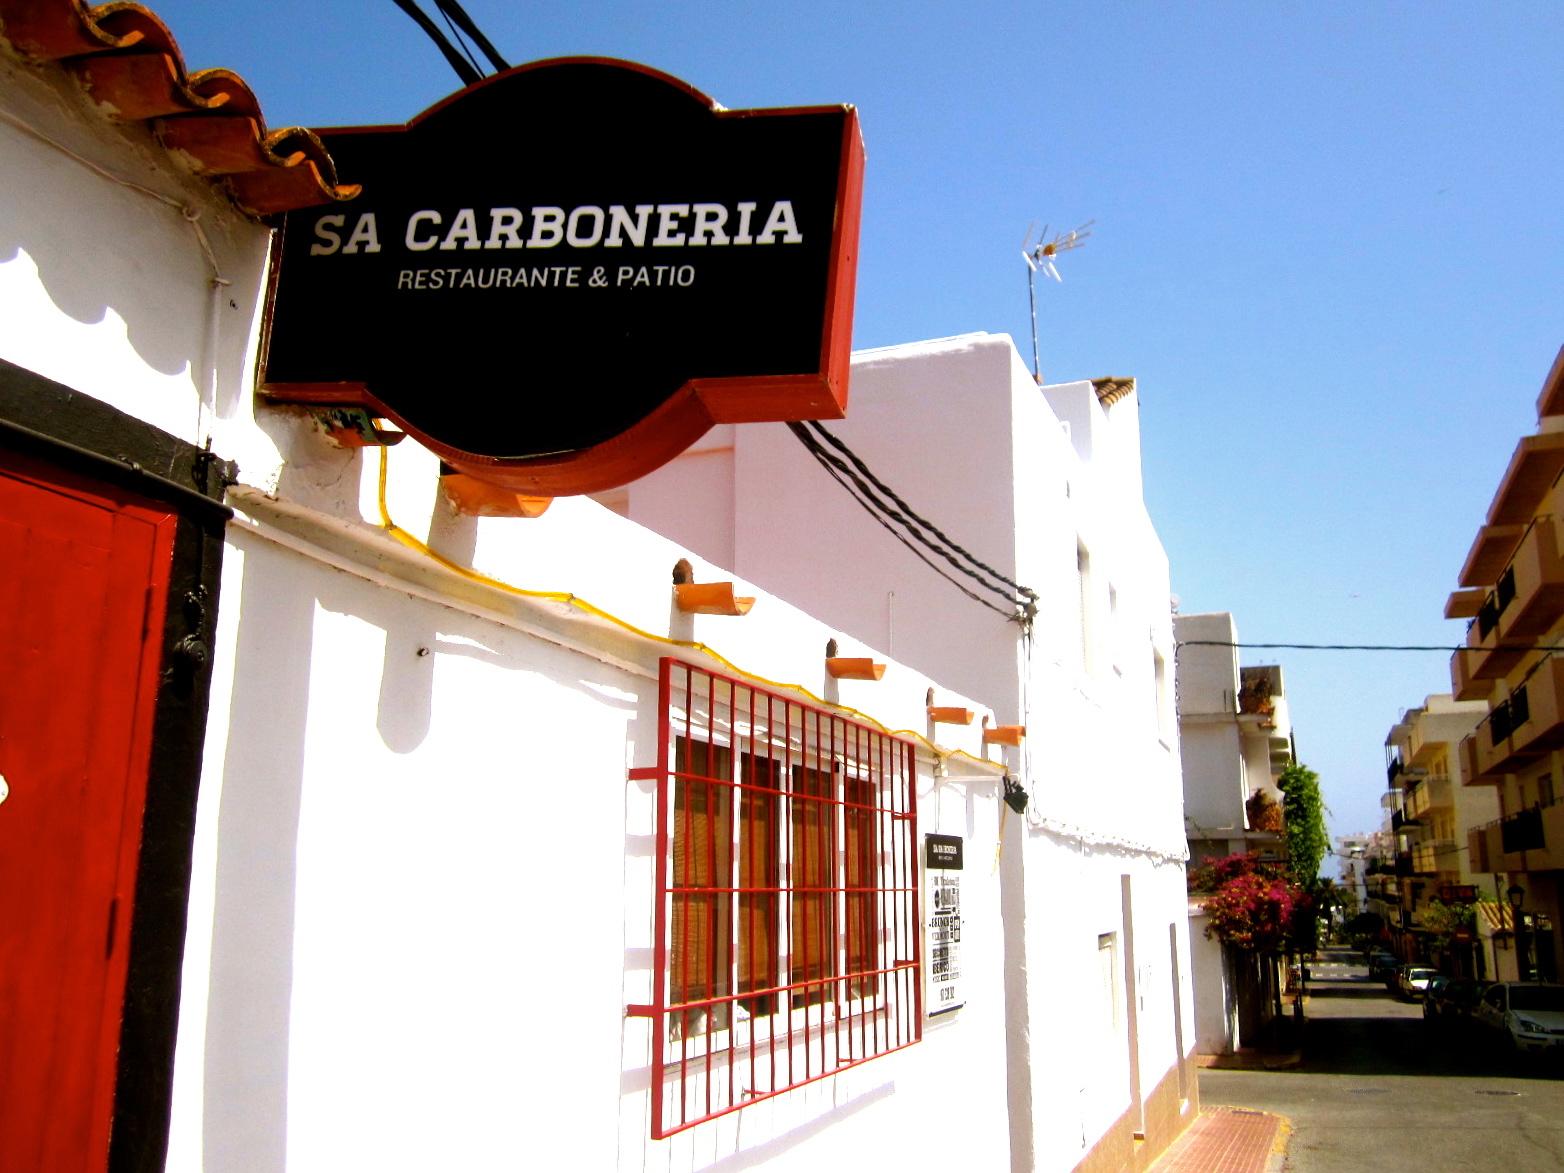 Come ibiza mejores restaurantes en ibiza sa carboner a - El limonero ibiza ...